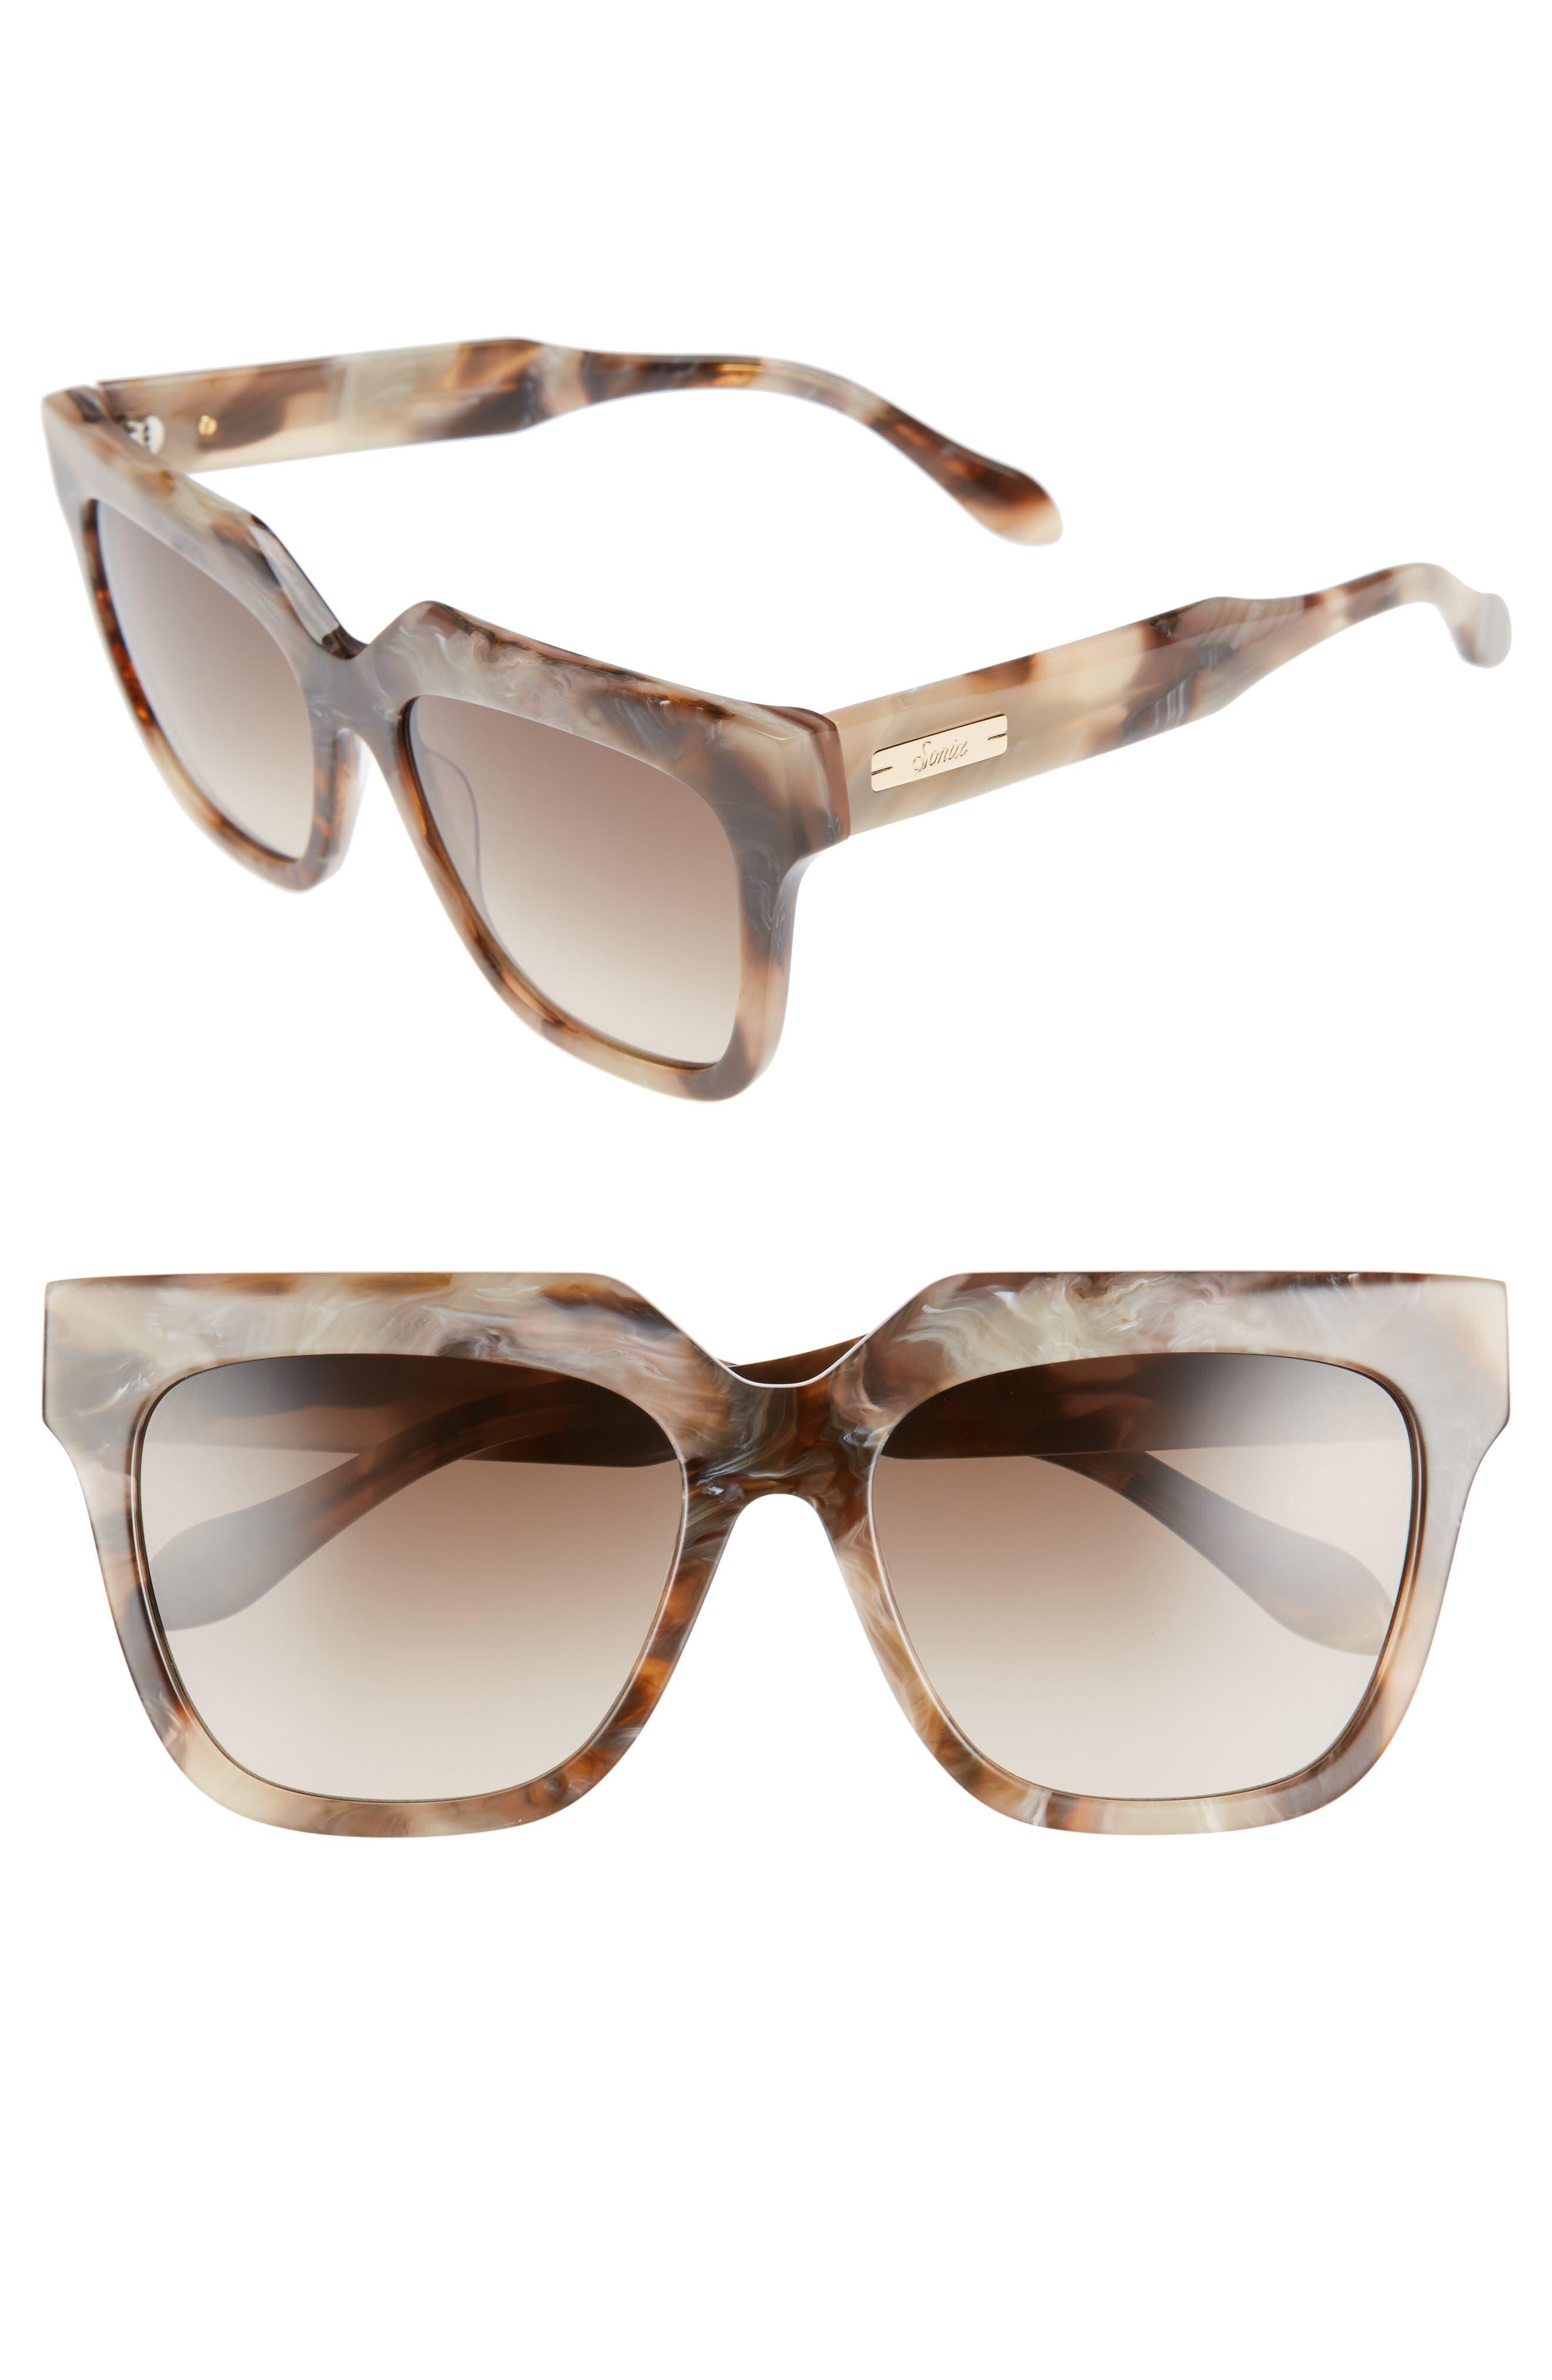 Sonix Avalon 55mm Gradient Lens Square Sunglasses